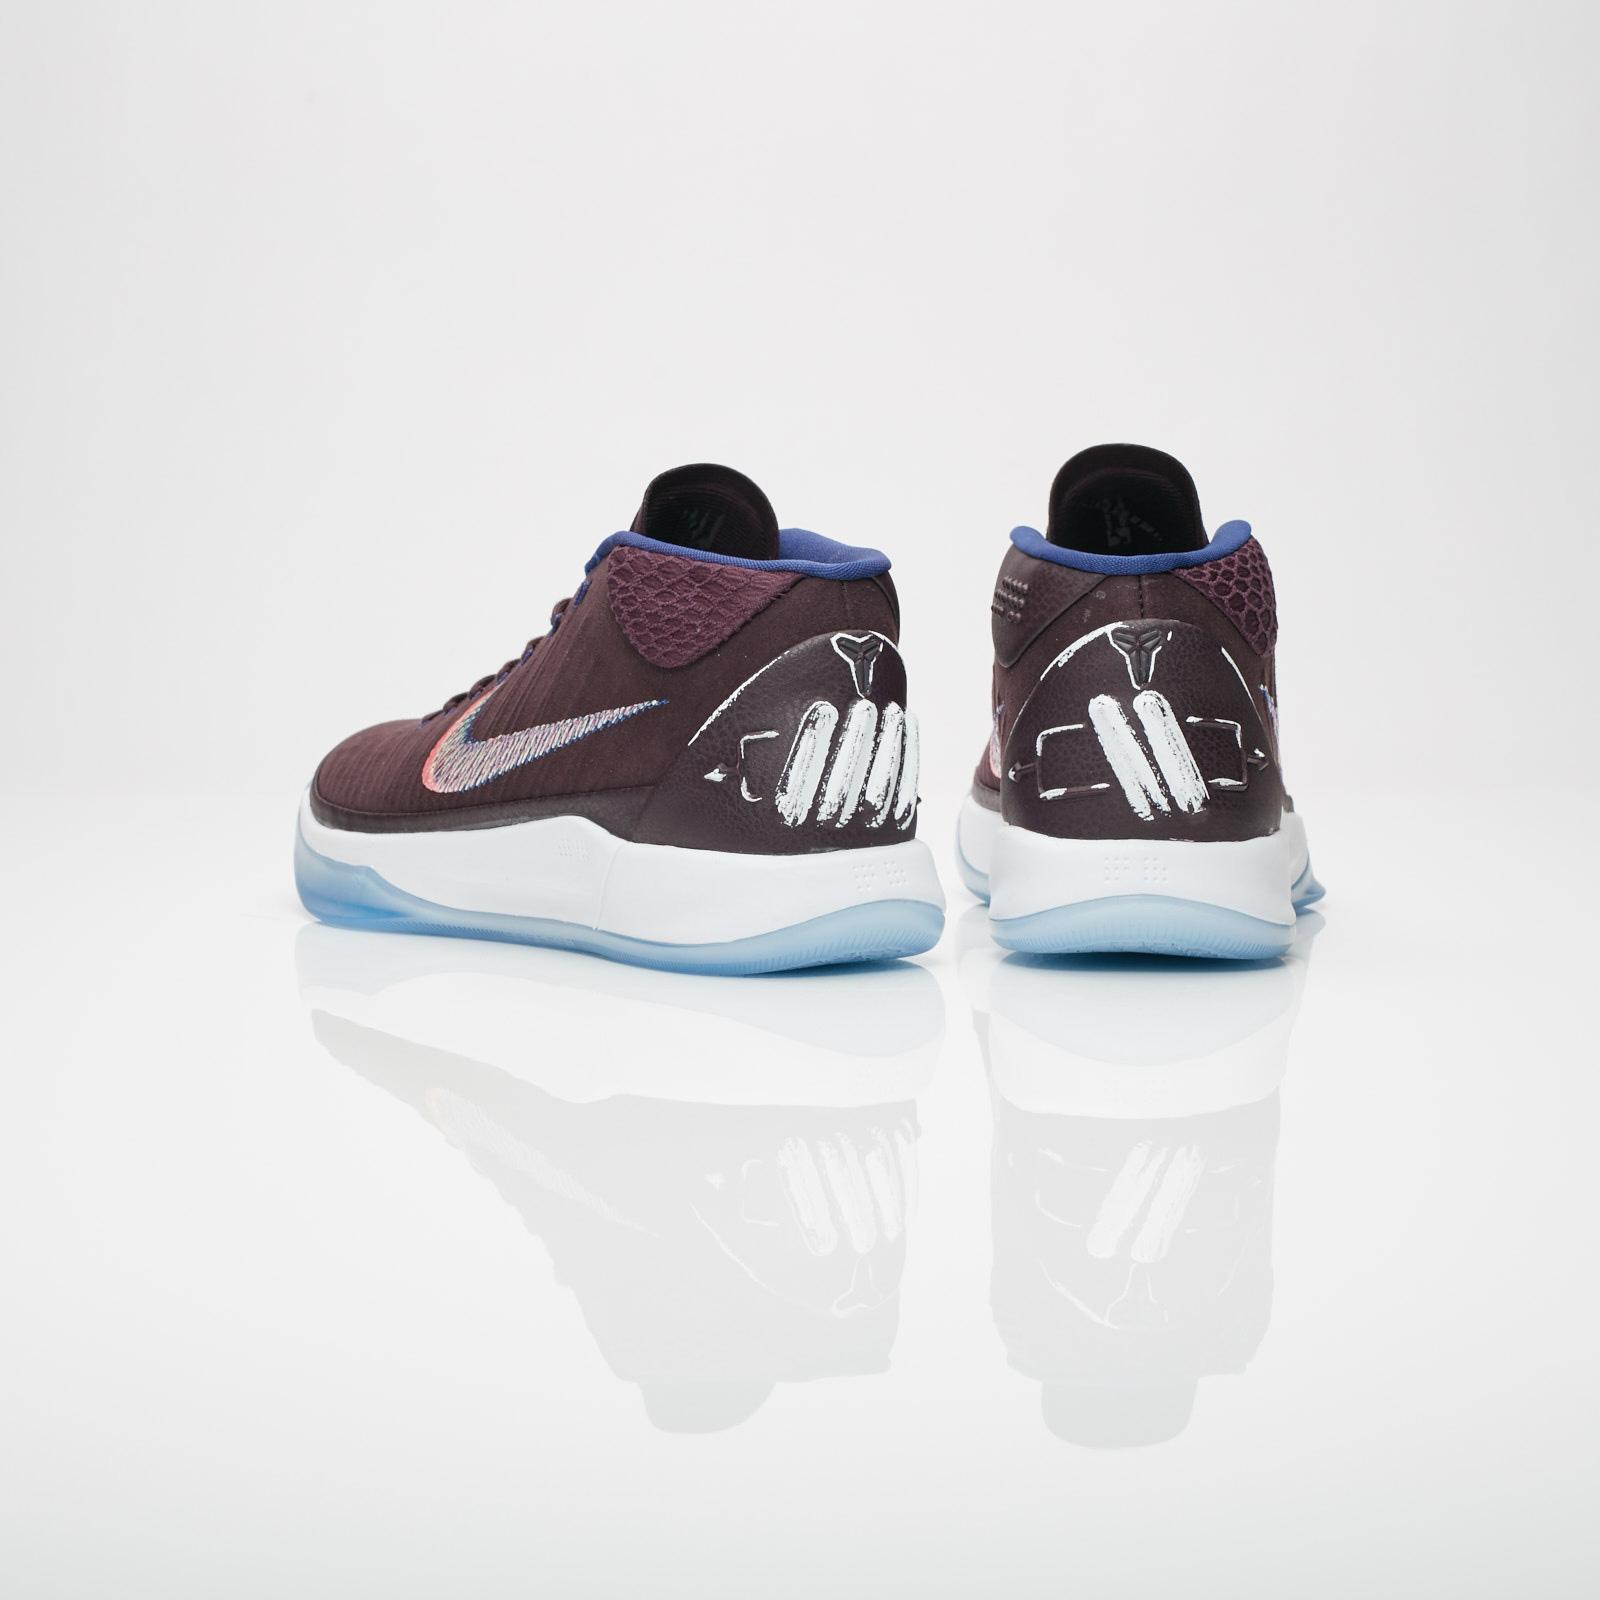 best sneakers d3c77 6a8bd Nike Basketball Kobe AD Nike Basketball Kobe AD ...